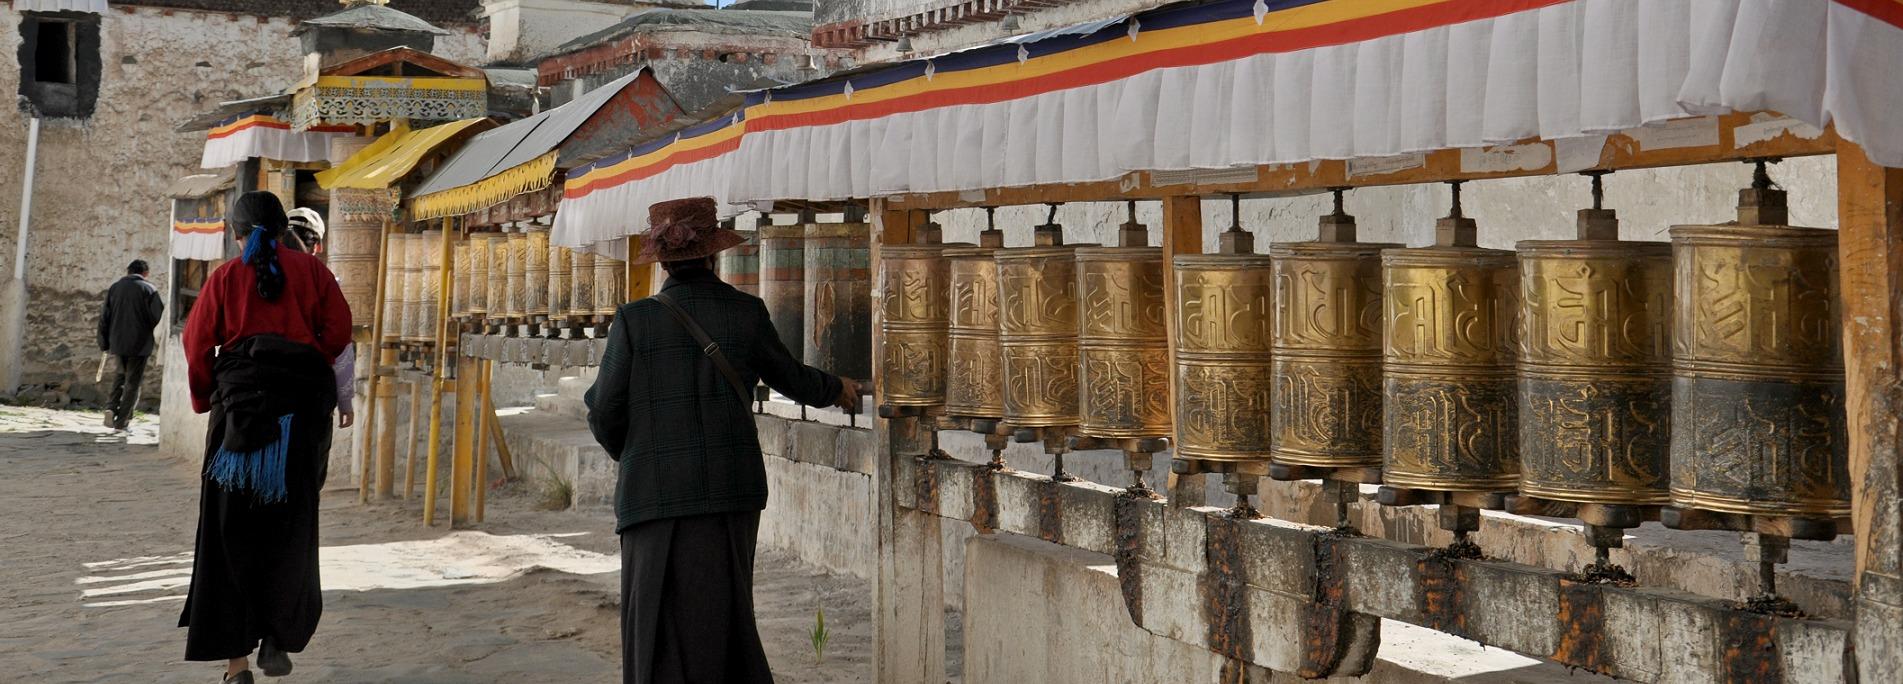 Lhasa to Shigatse is a golden tour route.